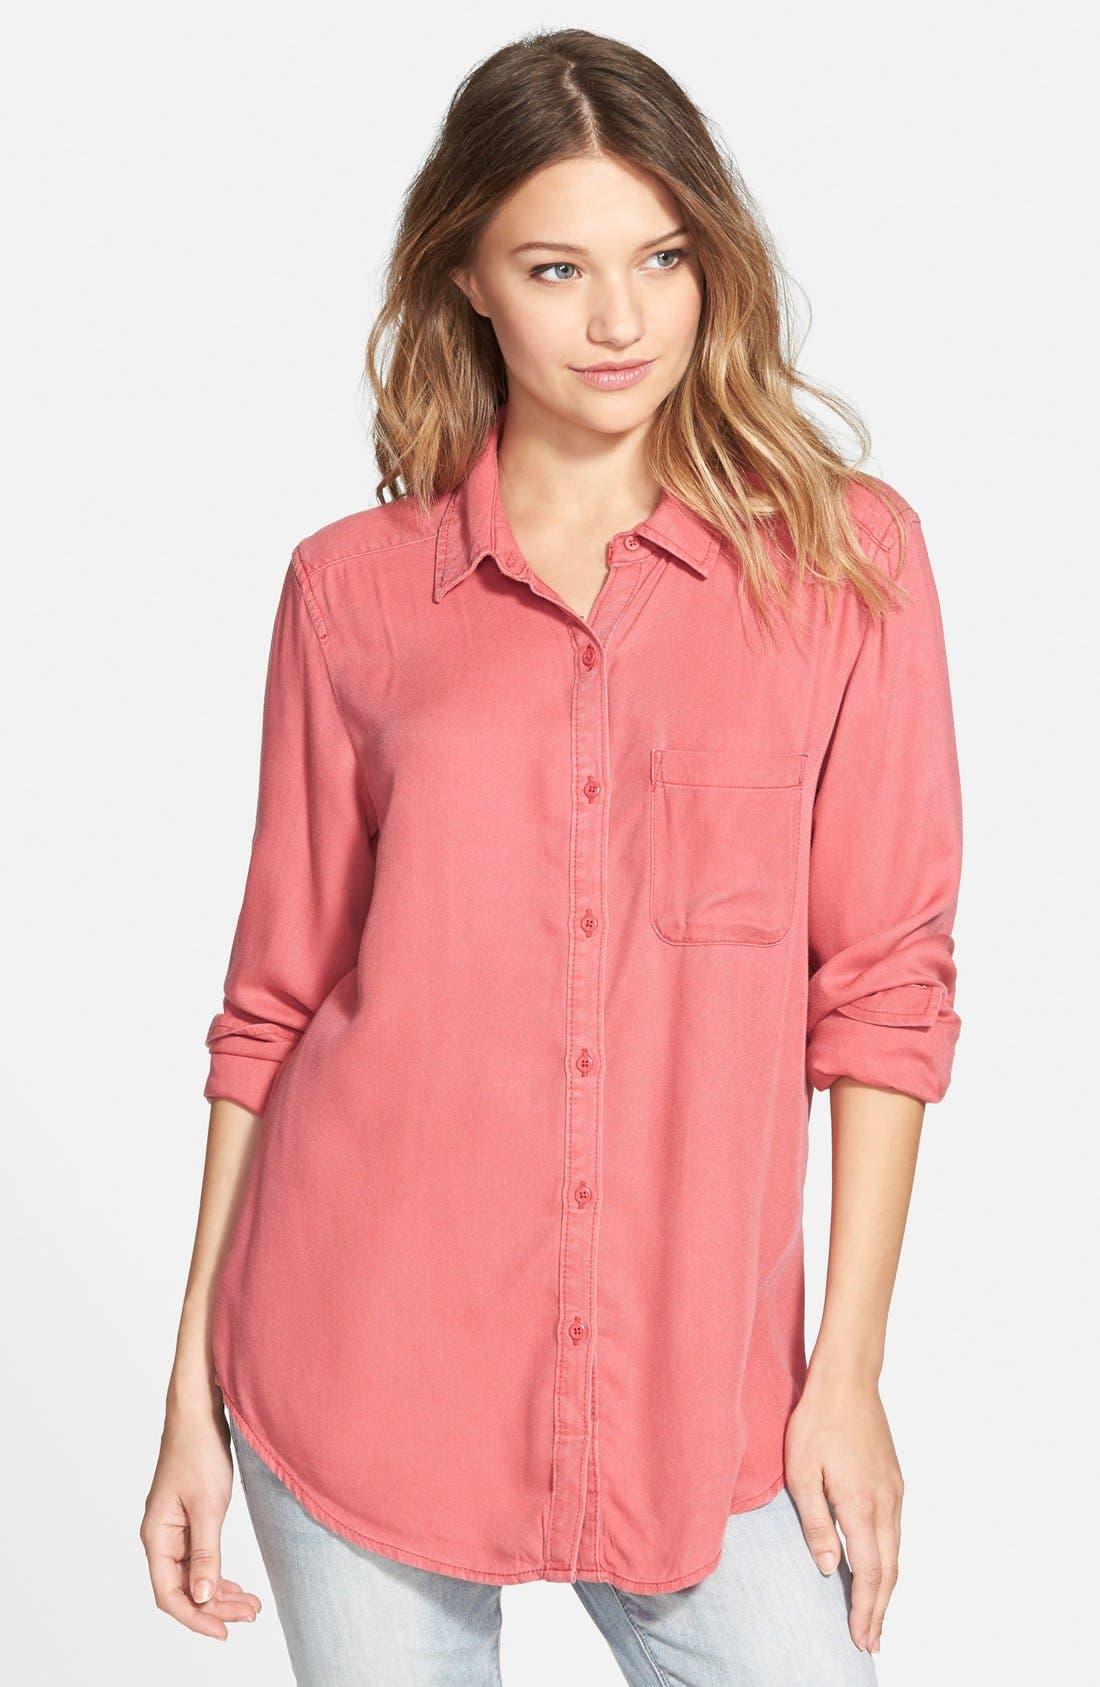 Alternate Image 1 Selected - BP. Washed Chambray Shirt (Juniors)